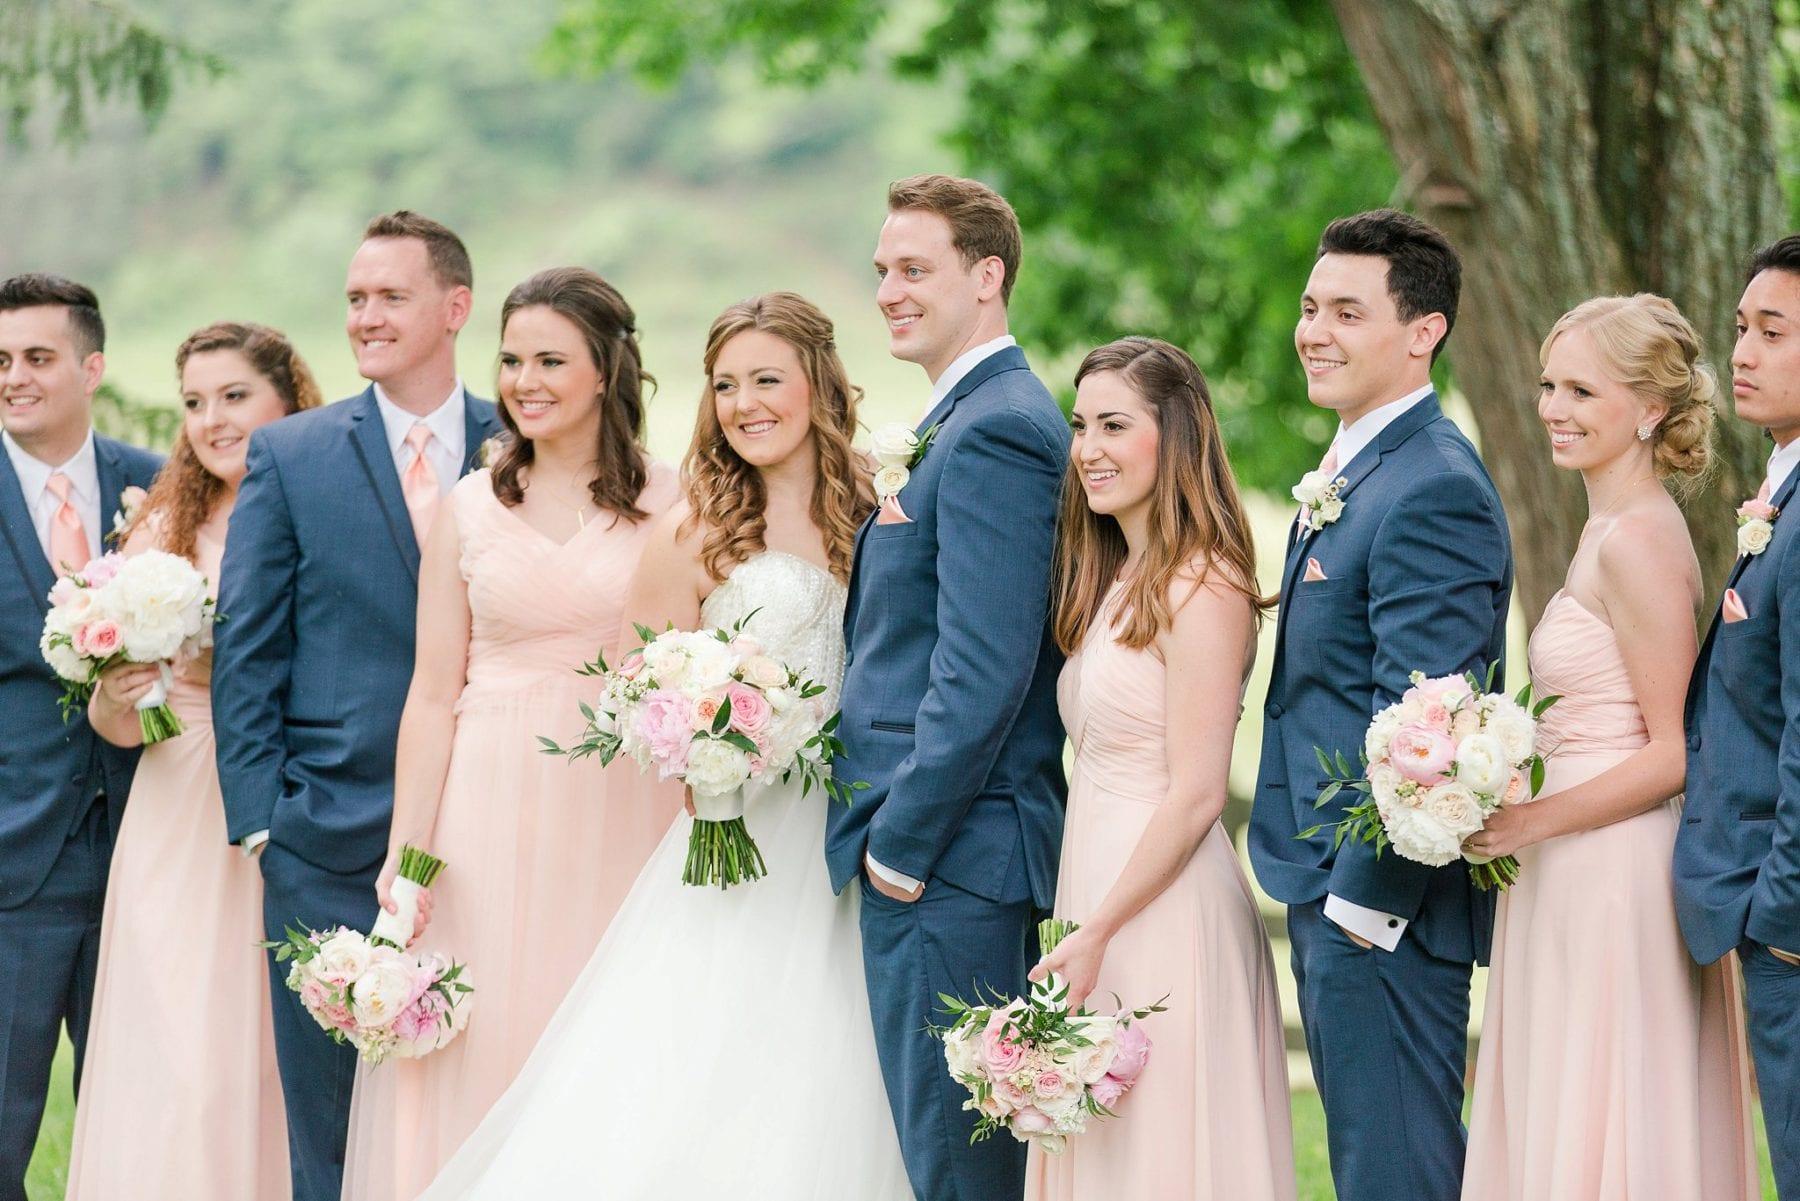 Justin & Megan Big Spring Farm Wedding Photos-143.jpg